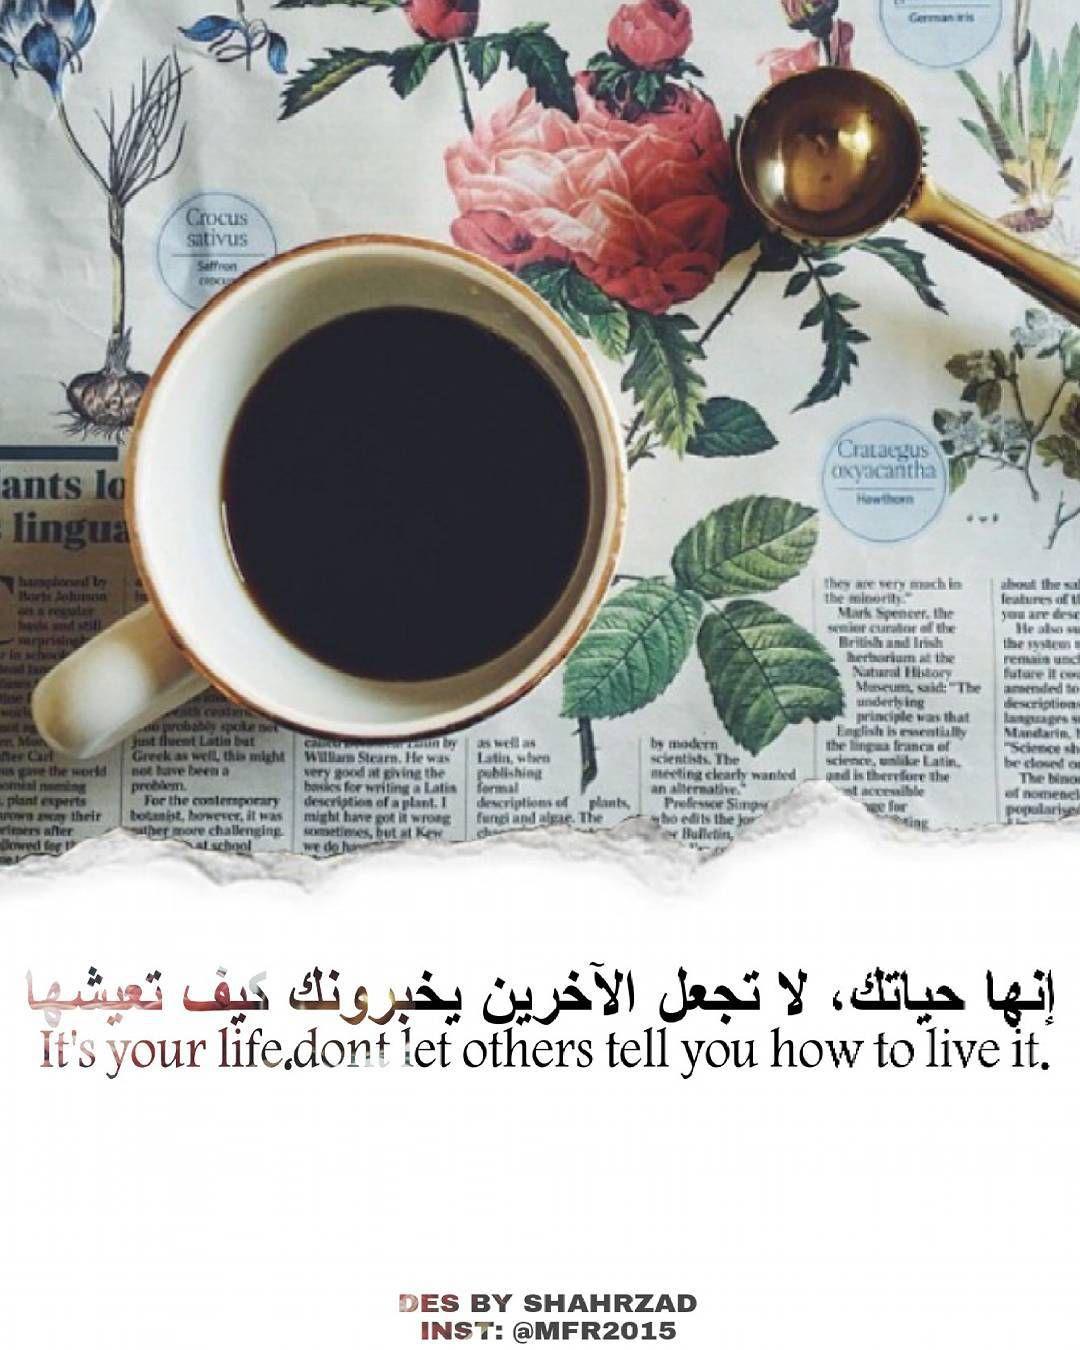 عش حياتك كما تريد لا كما يريدون لك Coffee And Books Glassware Tableware